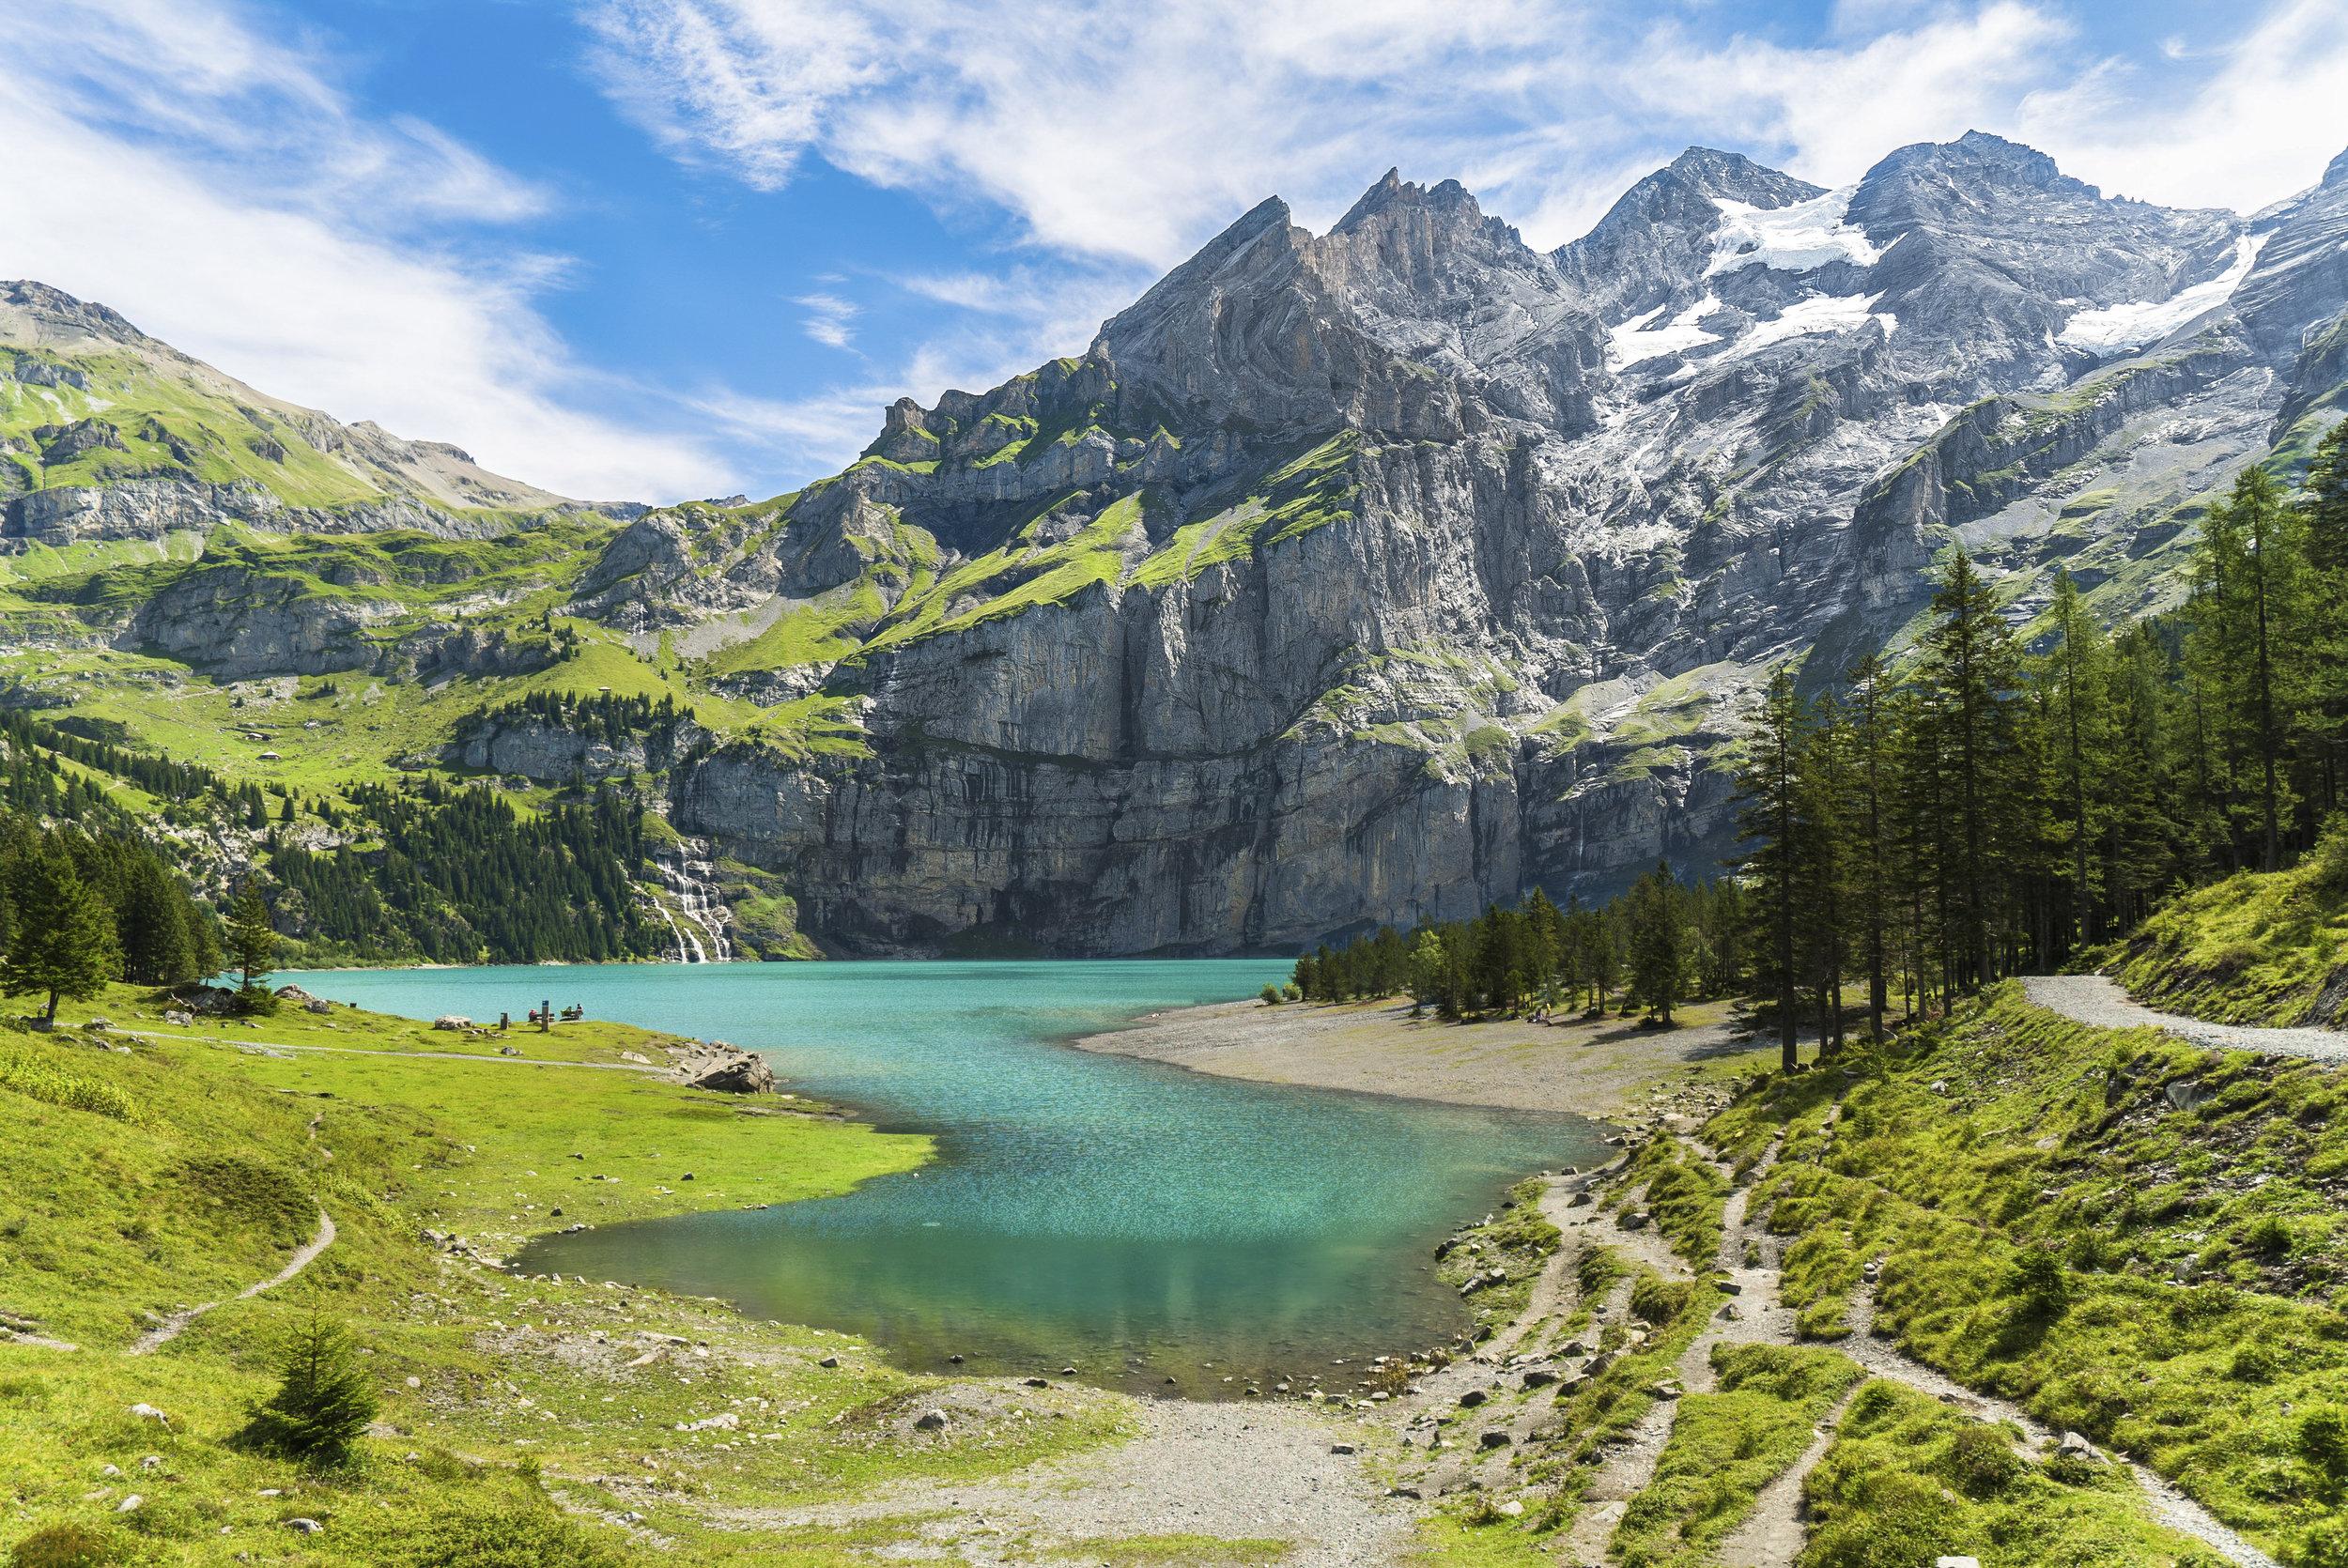 Oeschinensee lake & mountains - Switzerland